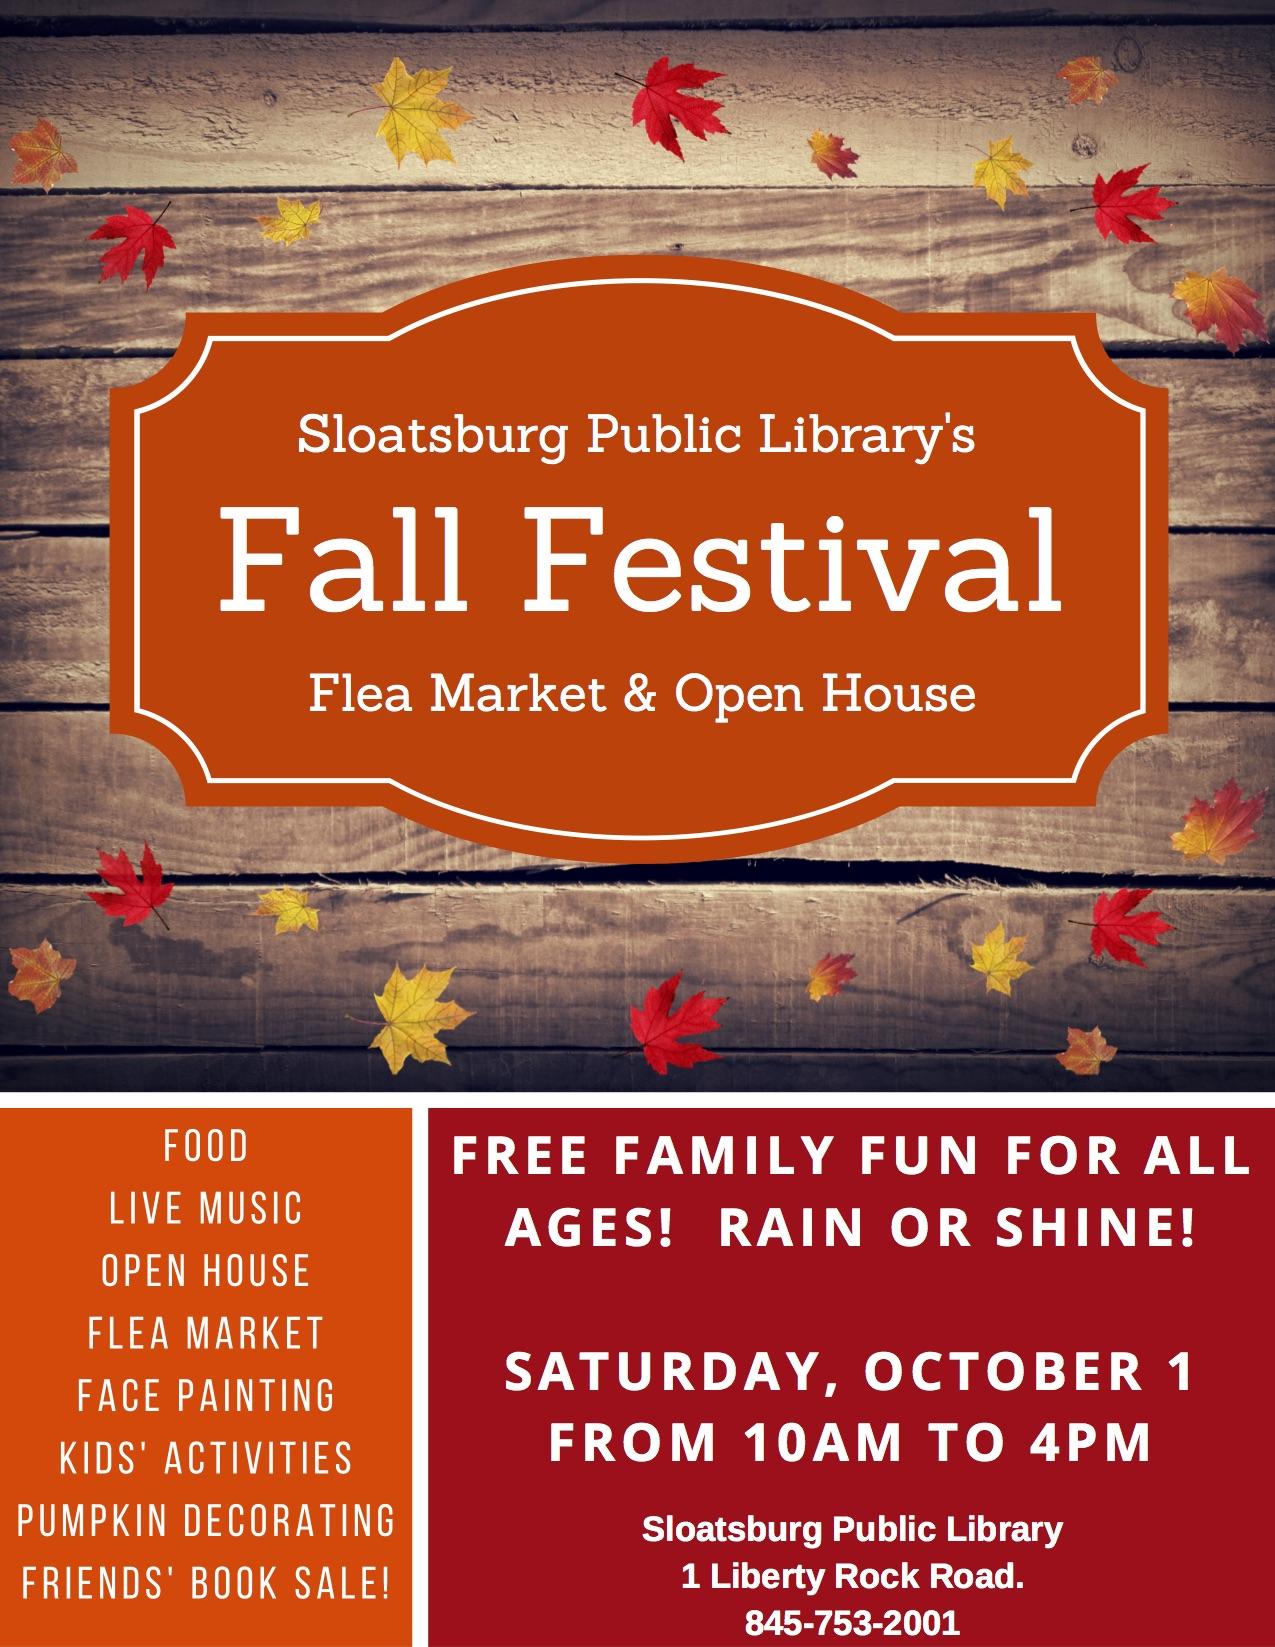 Library Fall Festival @ Sloatsburg Public Library | Sloatsburg | New York | United States